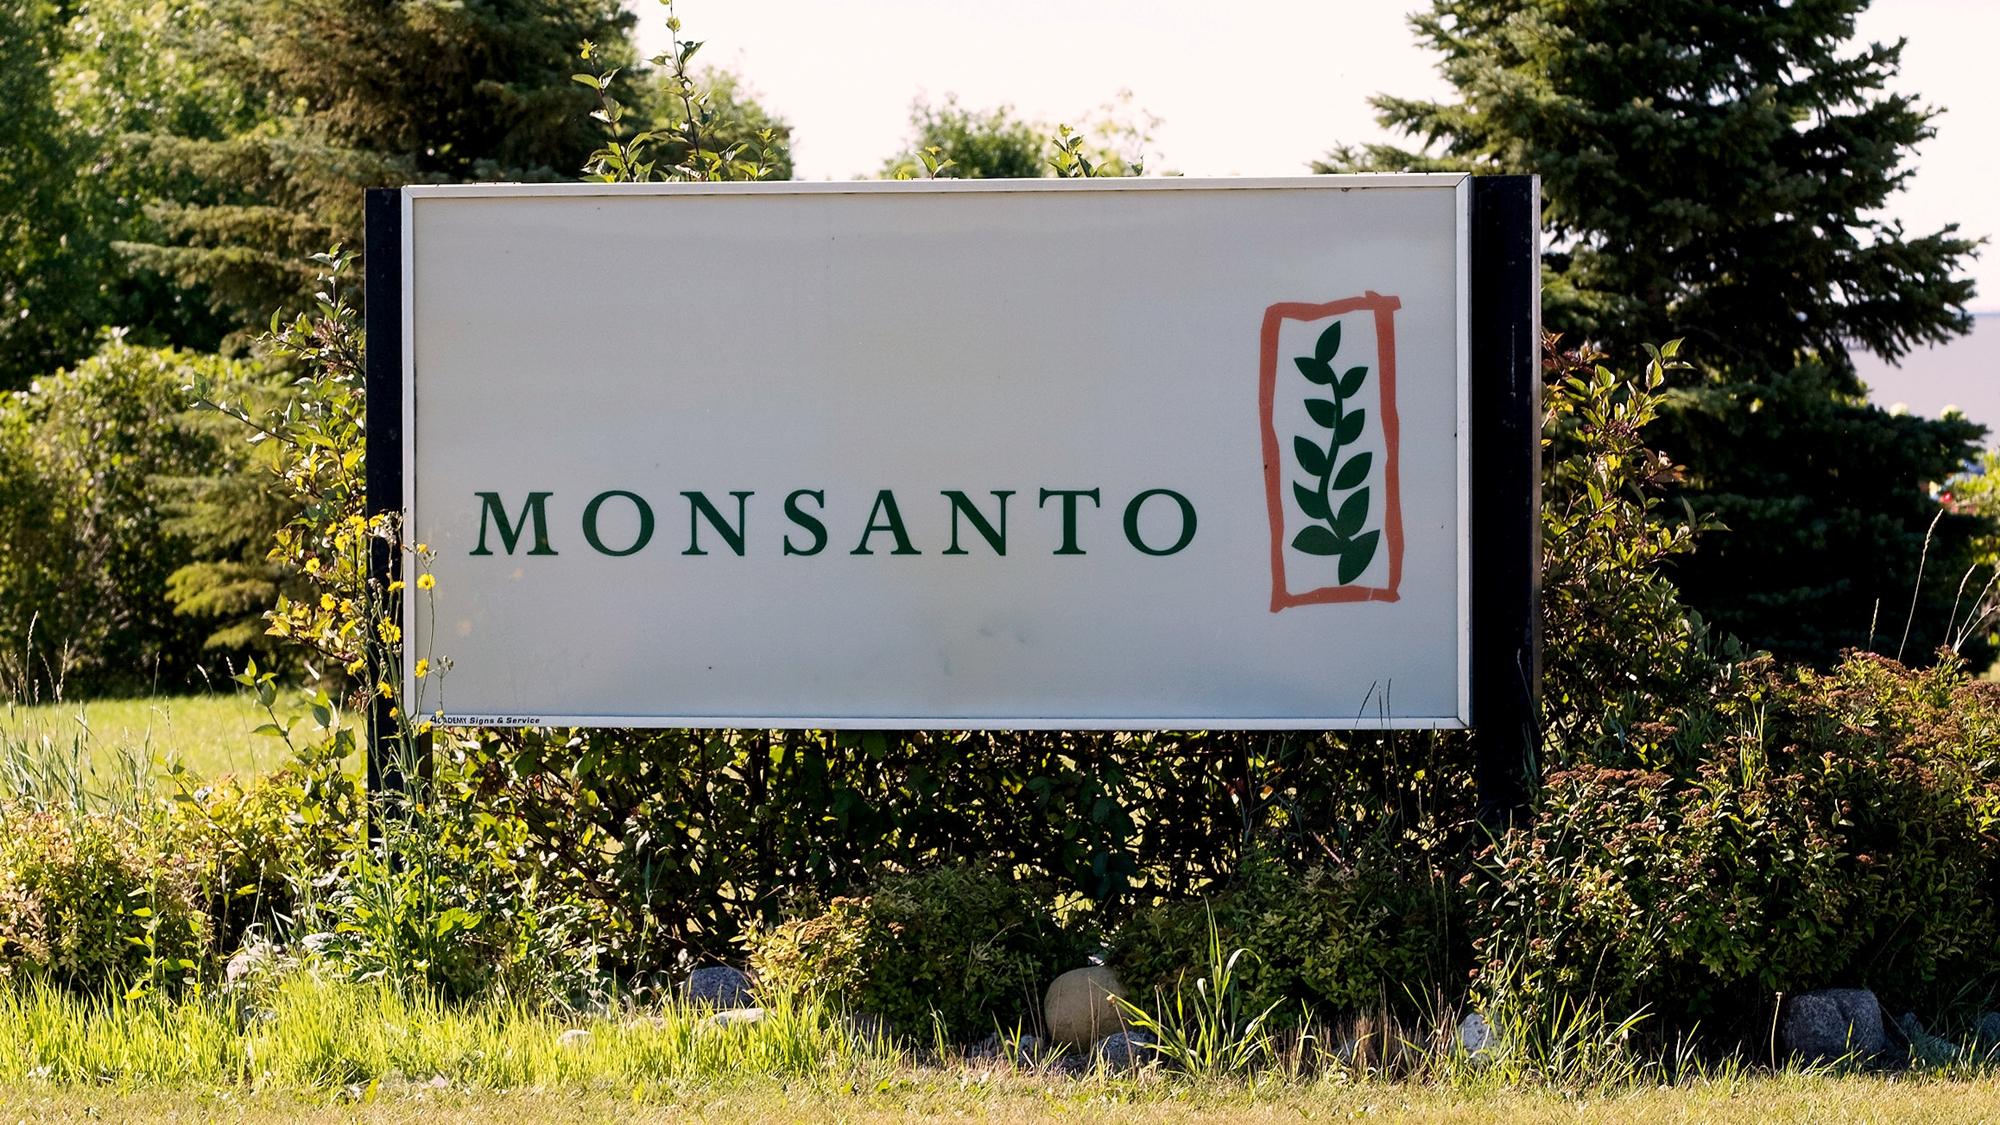 Juez de EU condena a Monsanto por uso de herbicida glifosato